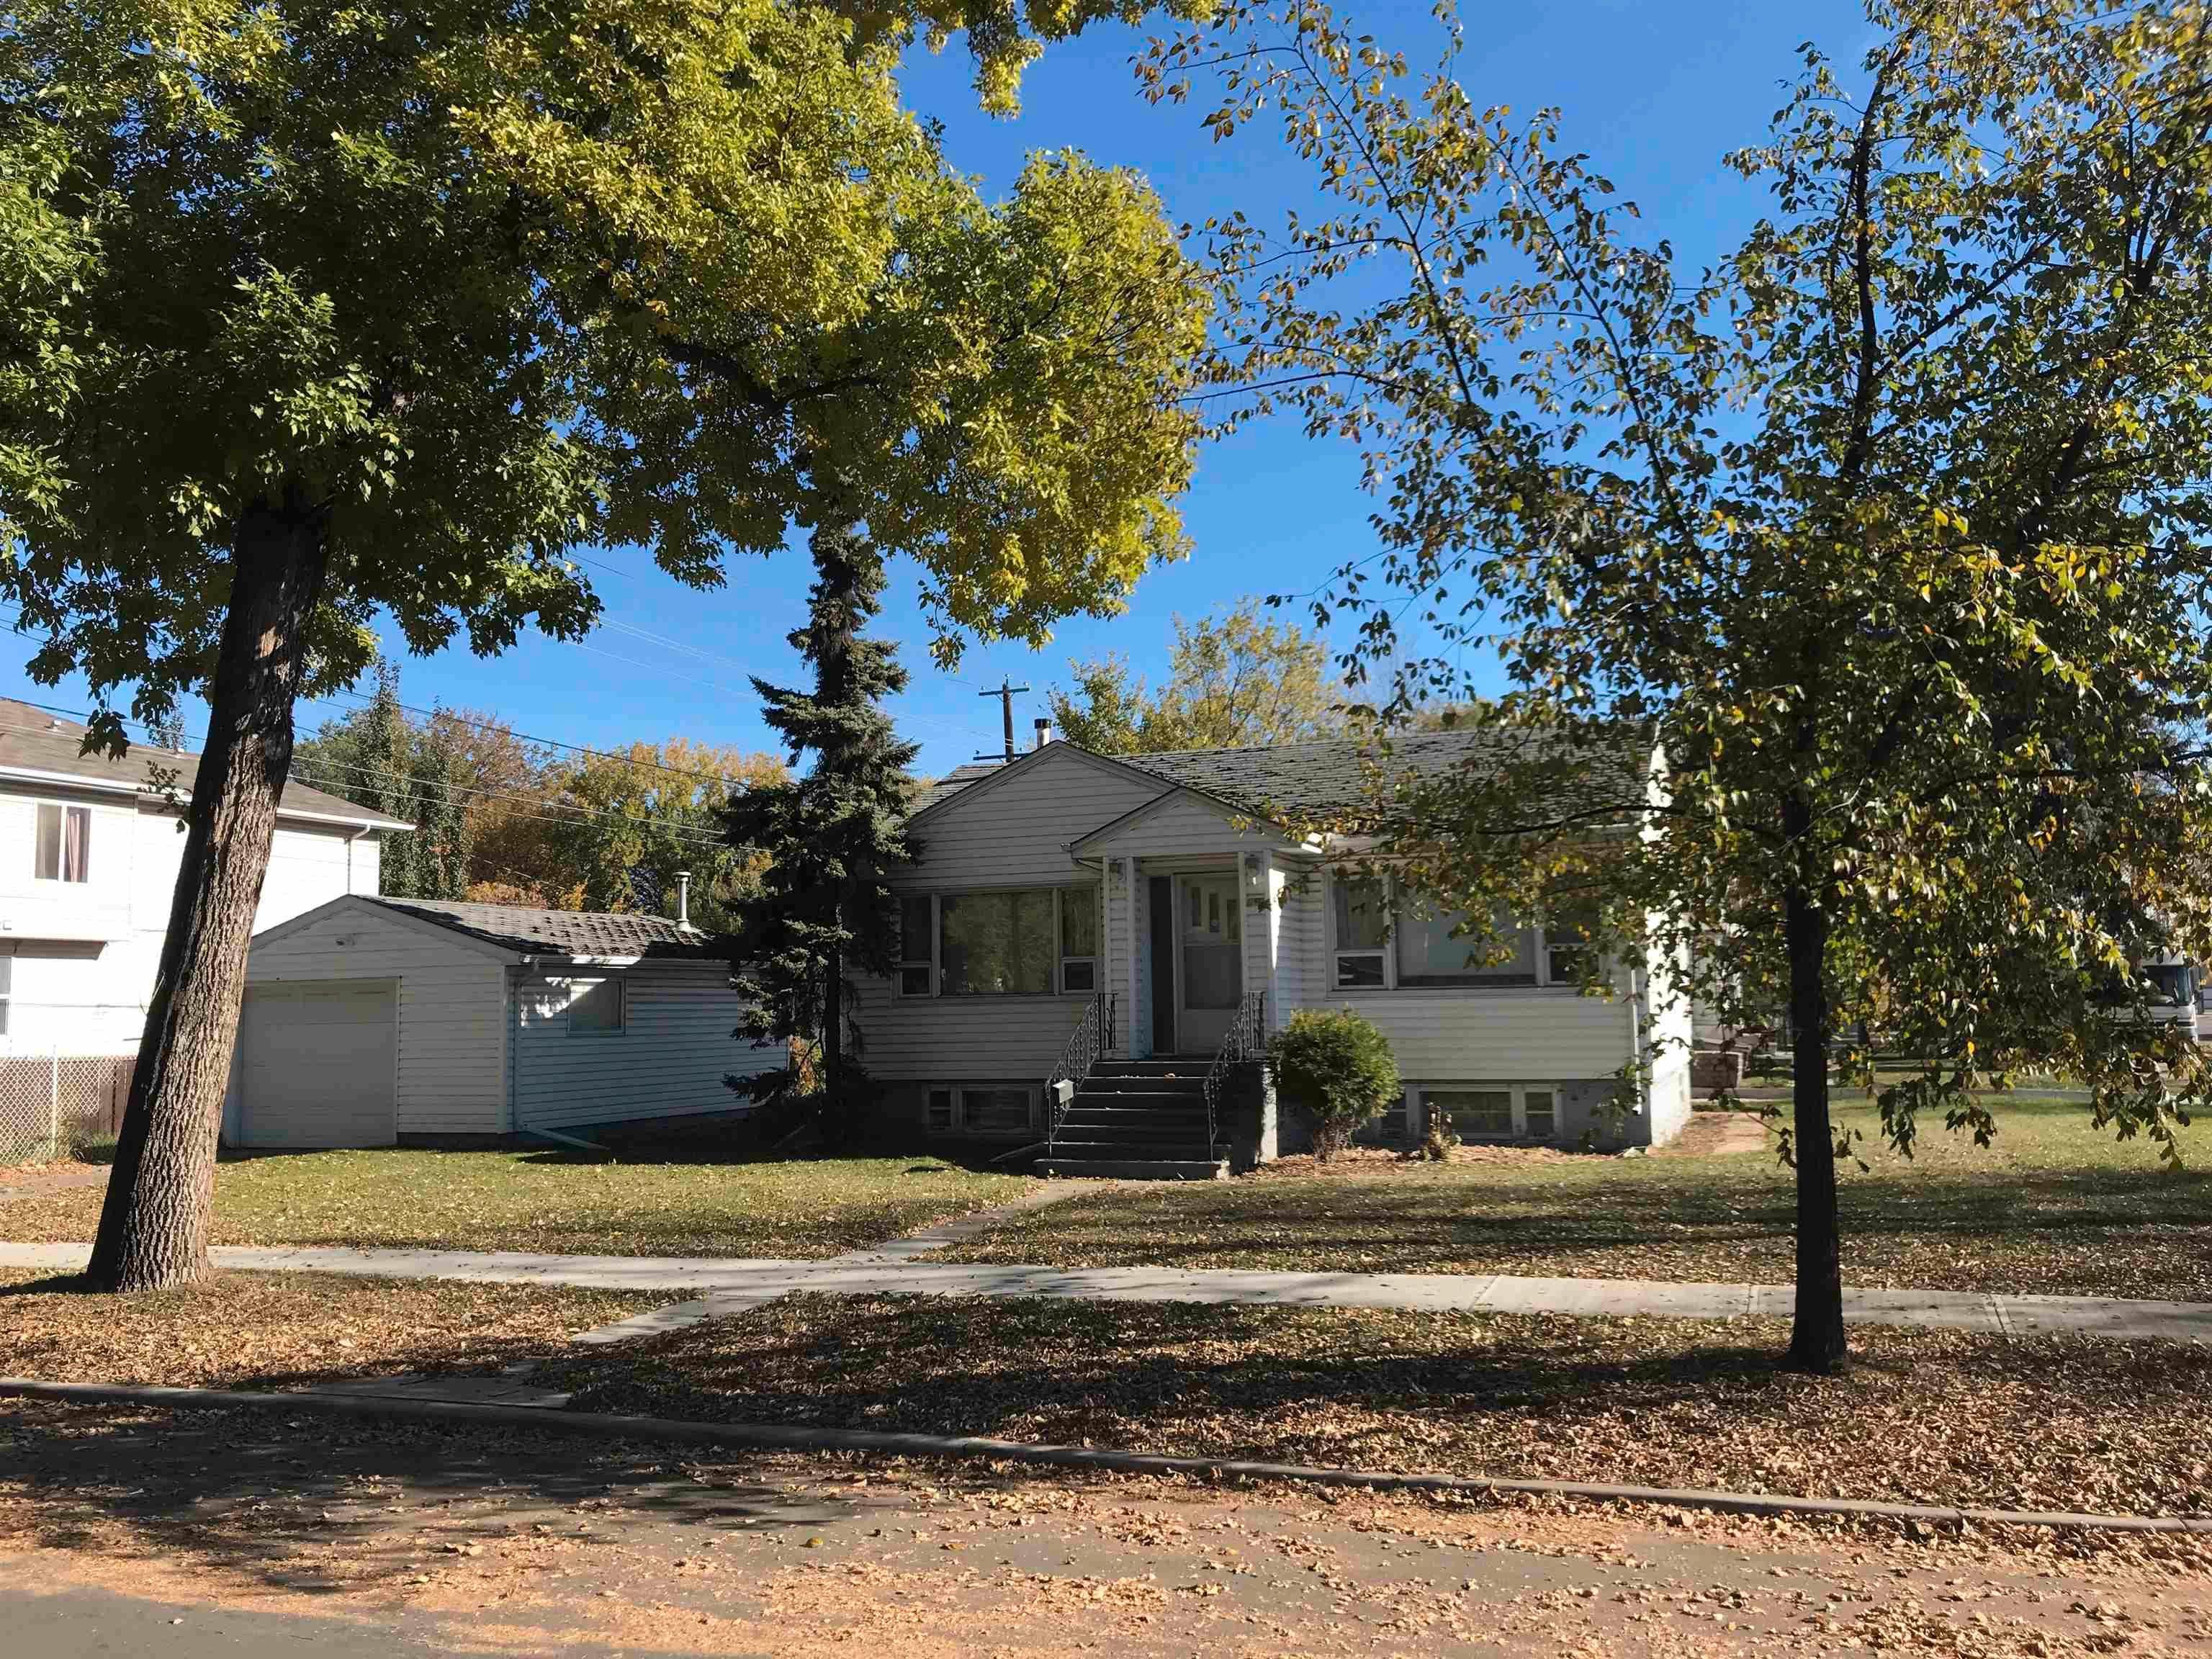 Main Photo: 11803 52 Street in Edmonton: Zone 06 House for sale : MLS®# E4266122